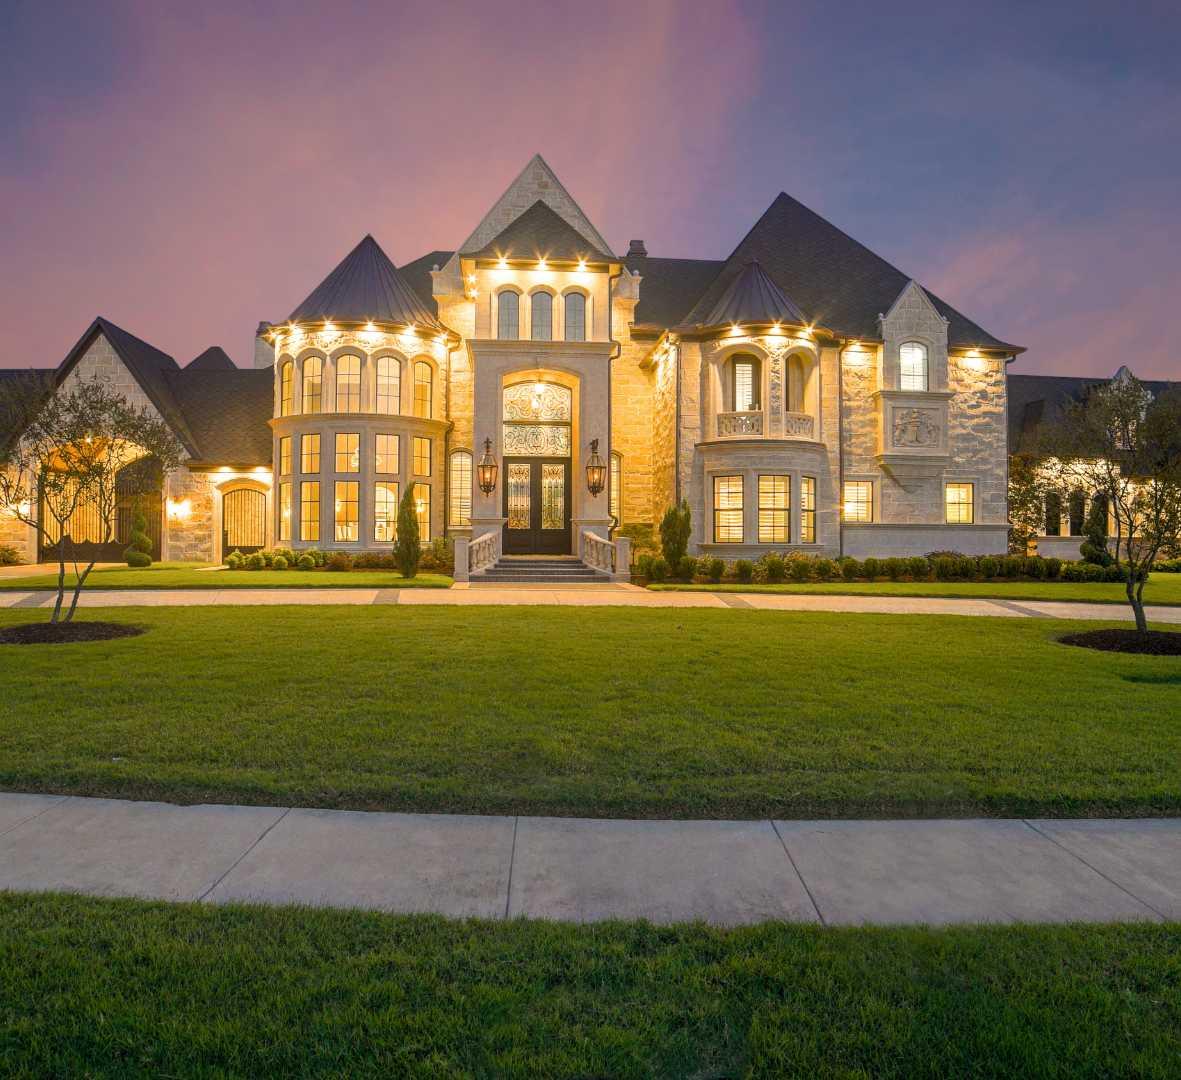 A mansion lit up in the dusk